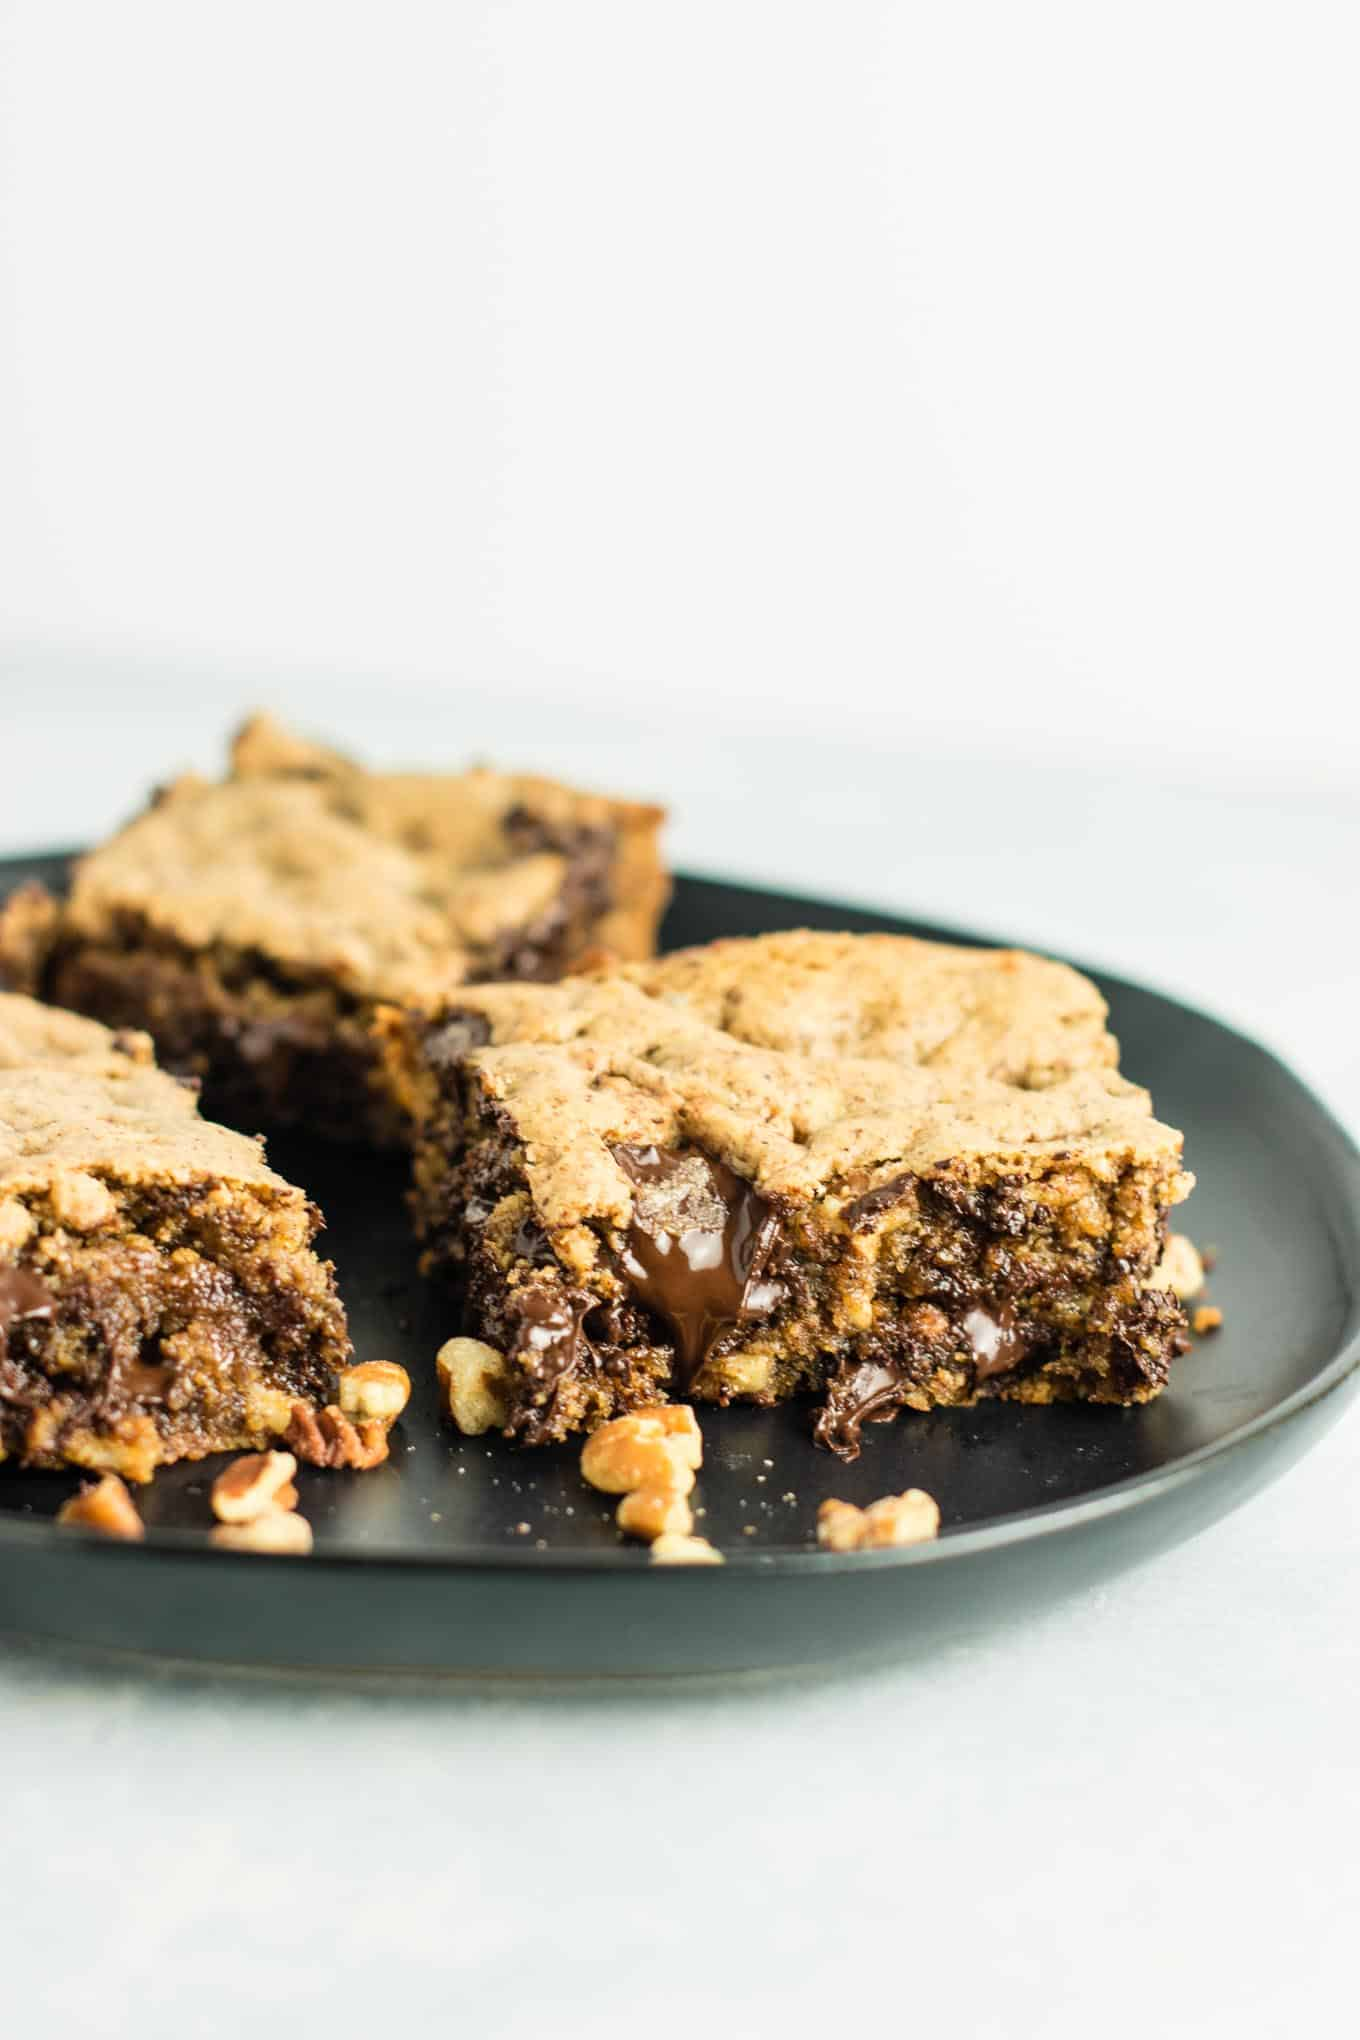 Flourless Oatmeal Chocolate Chip Cookie Recipe